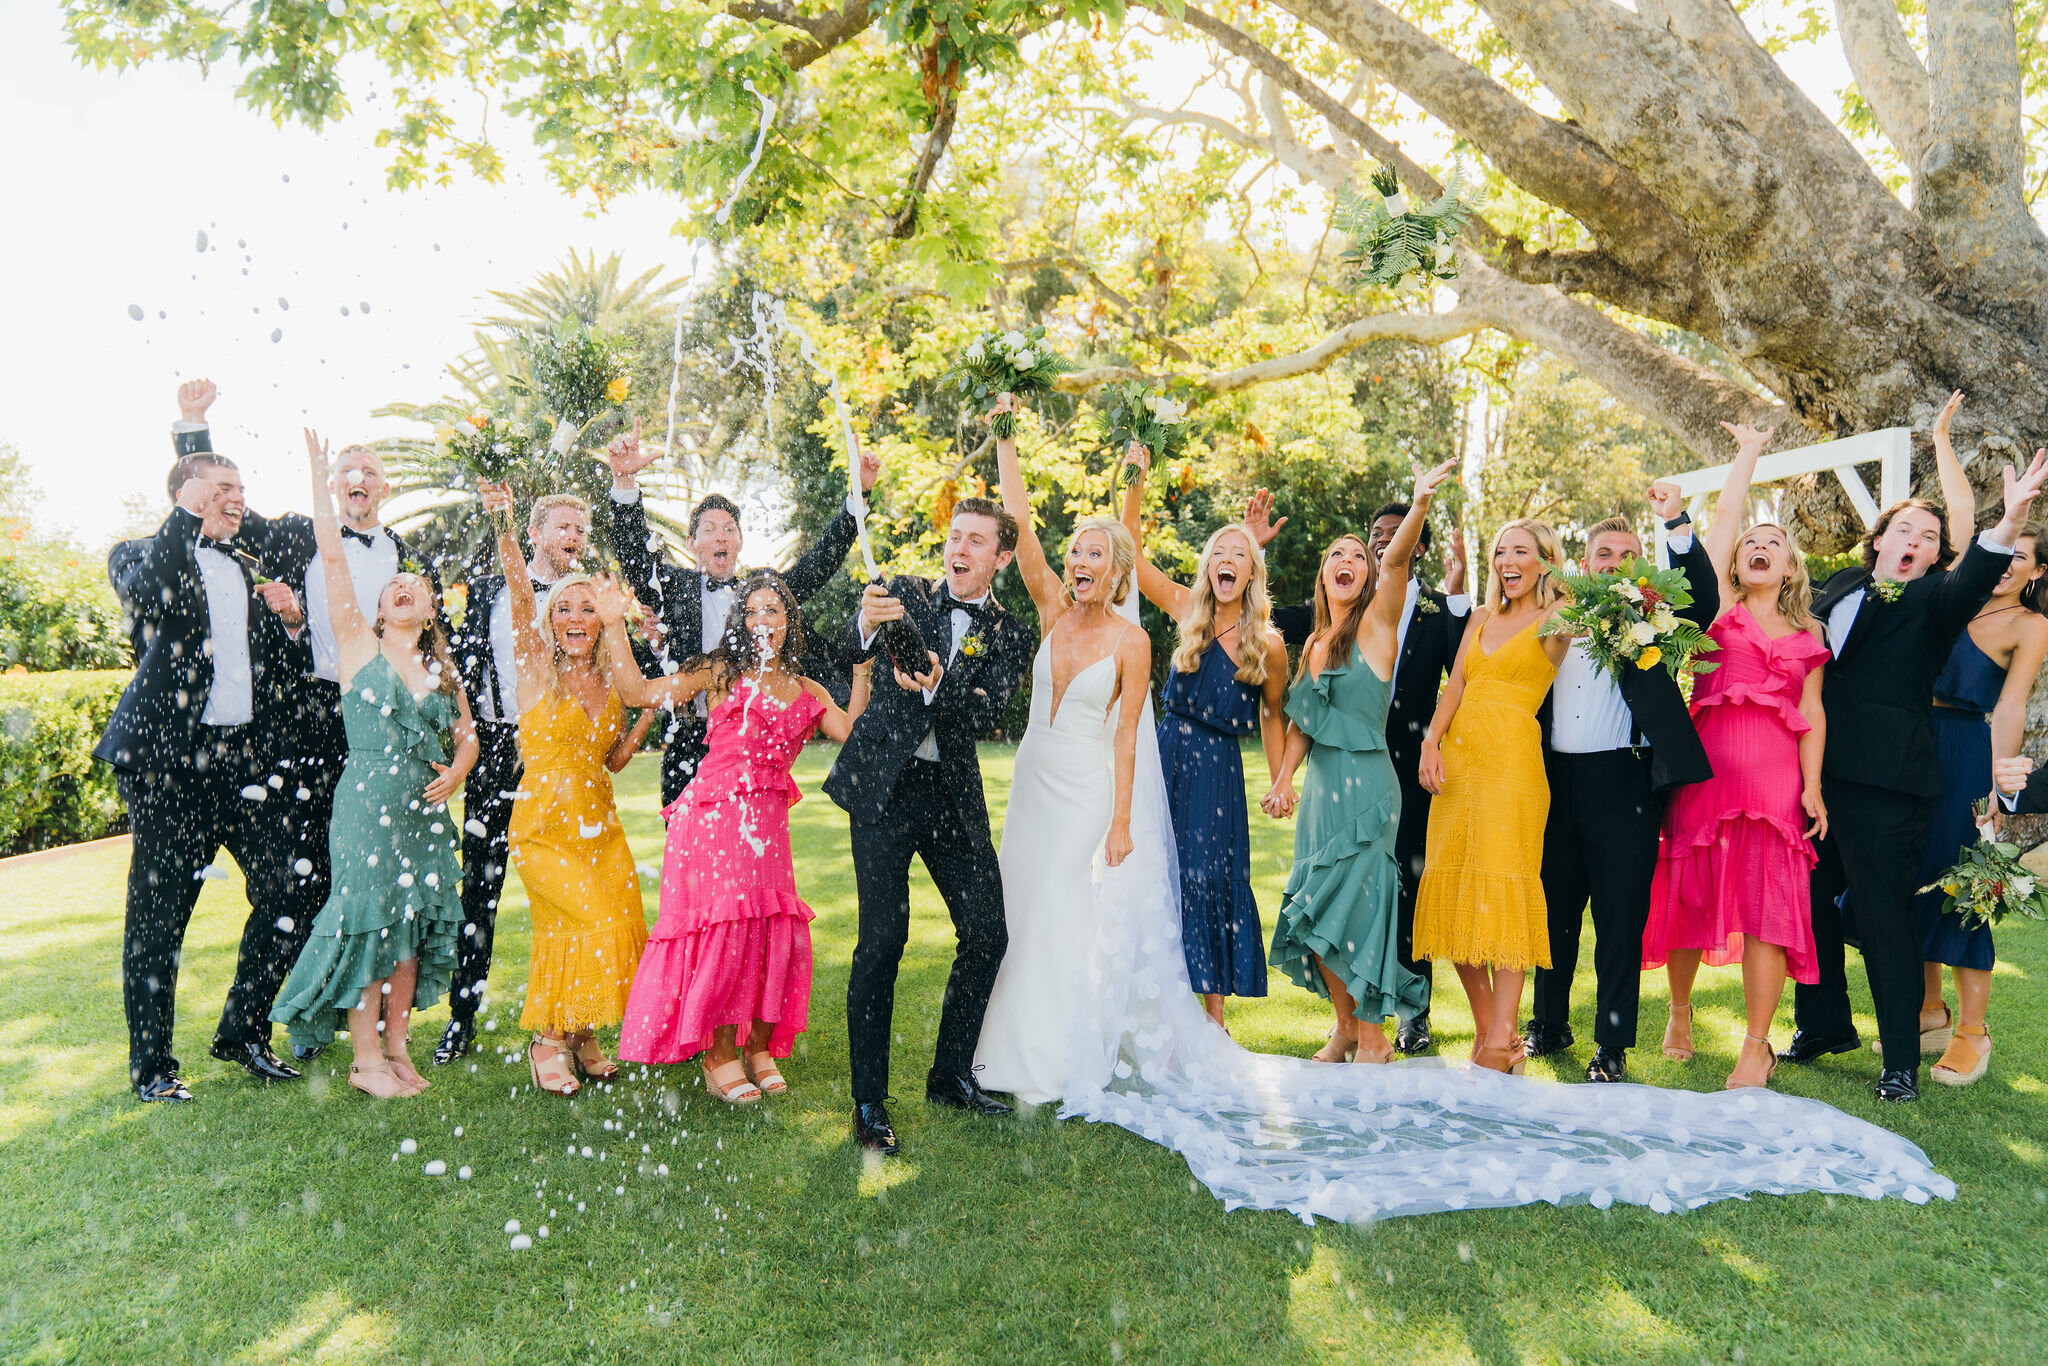 adamson-house-wedding-photography-087.jpg